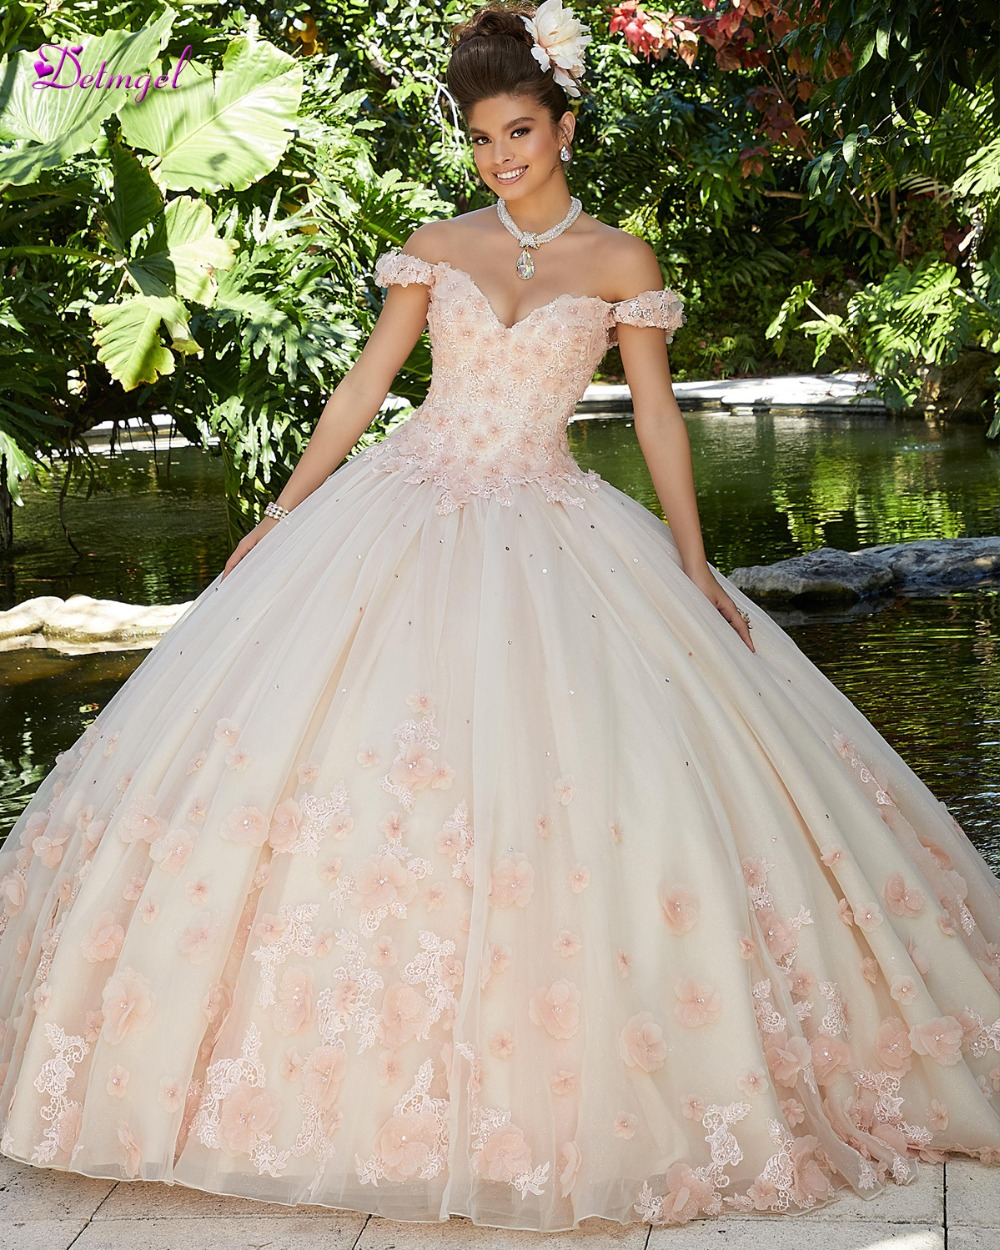 Detmgel Sexy Boat Neck Beaded Flowers Ball Gown Quinceanera Dresses 2019 Luxury Appliques Debutante Dress For Vestido De 15 Anos(China)